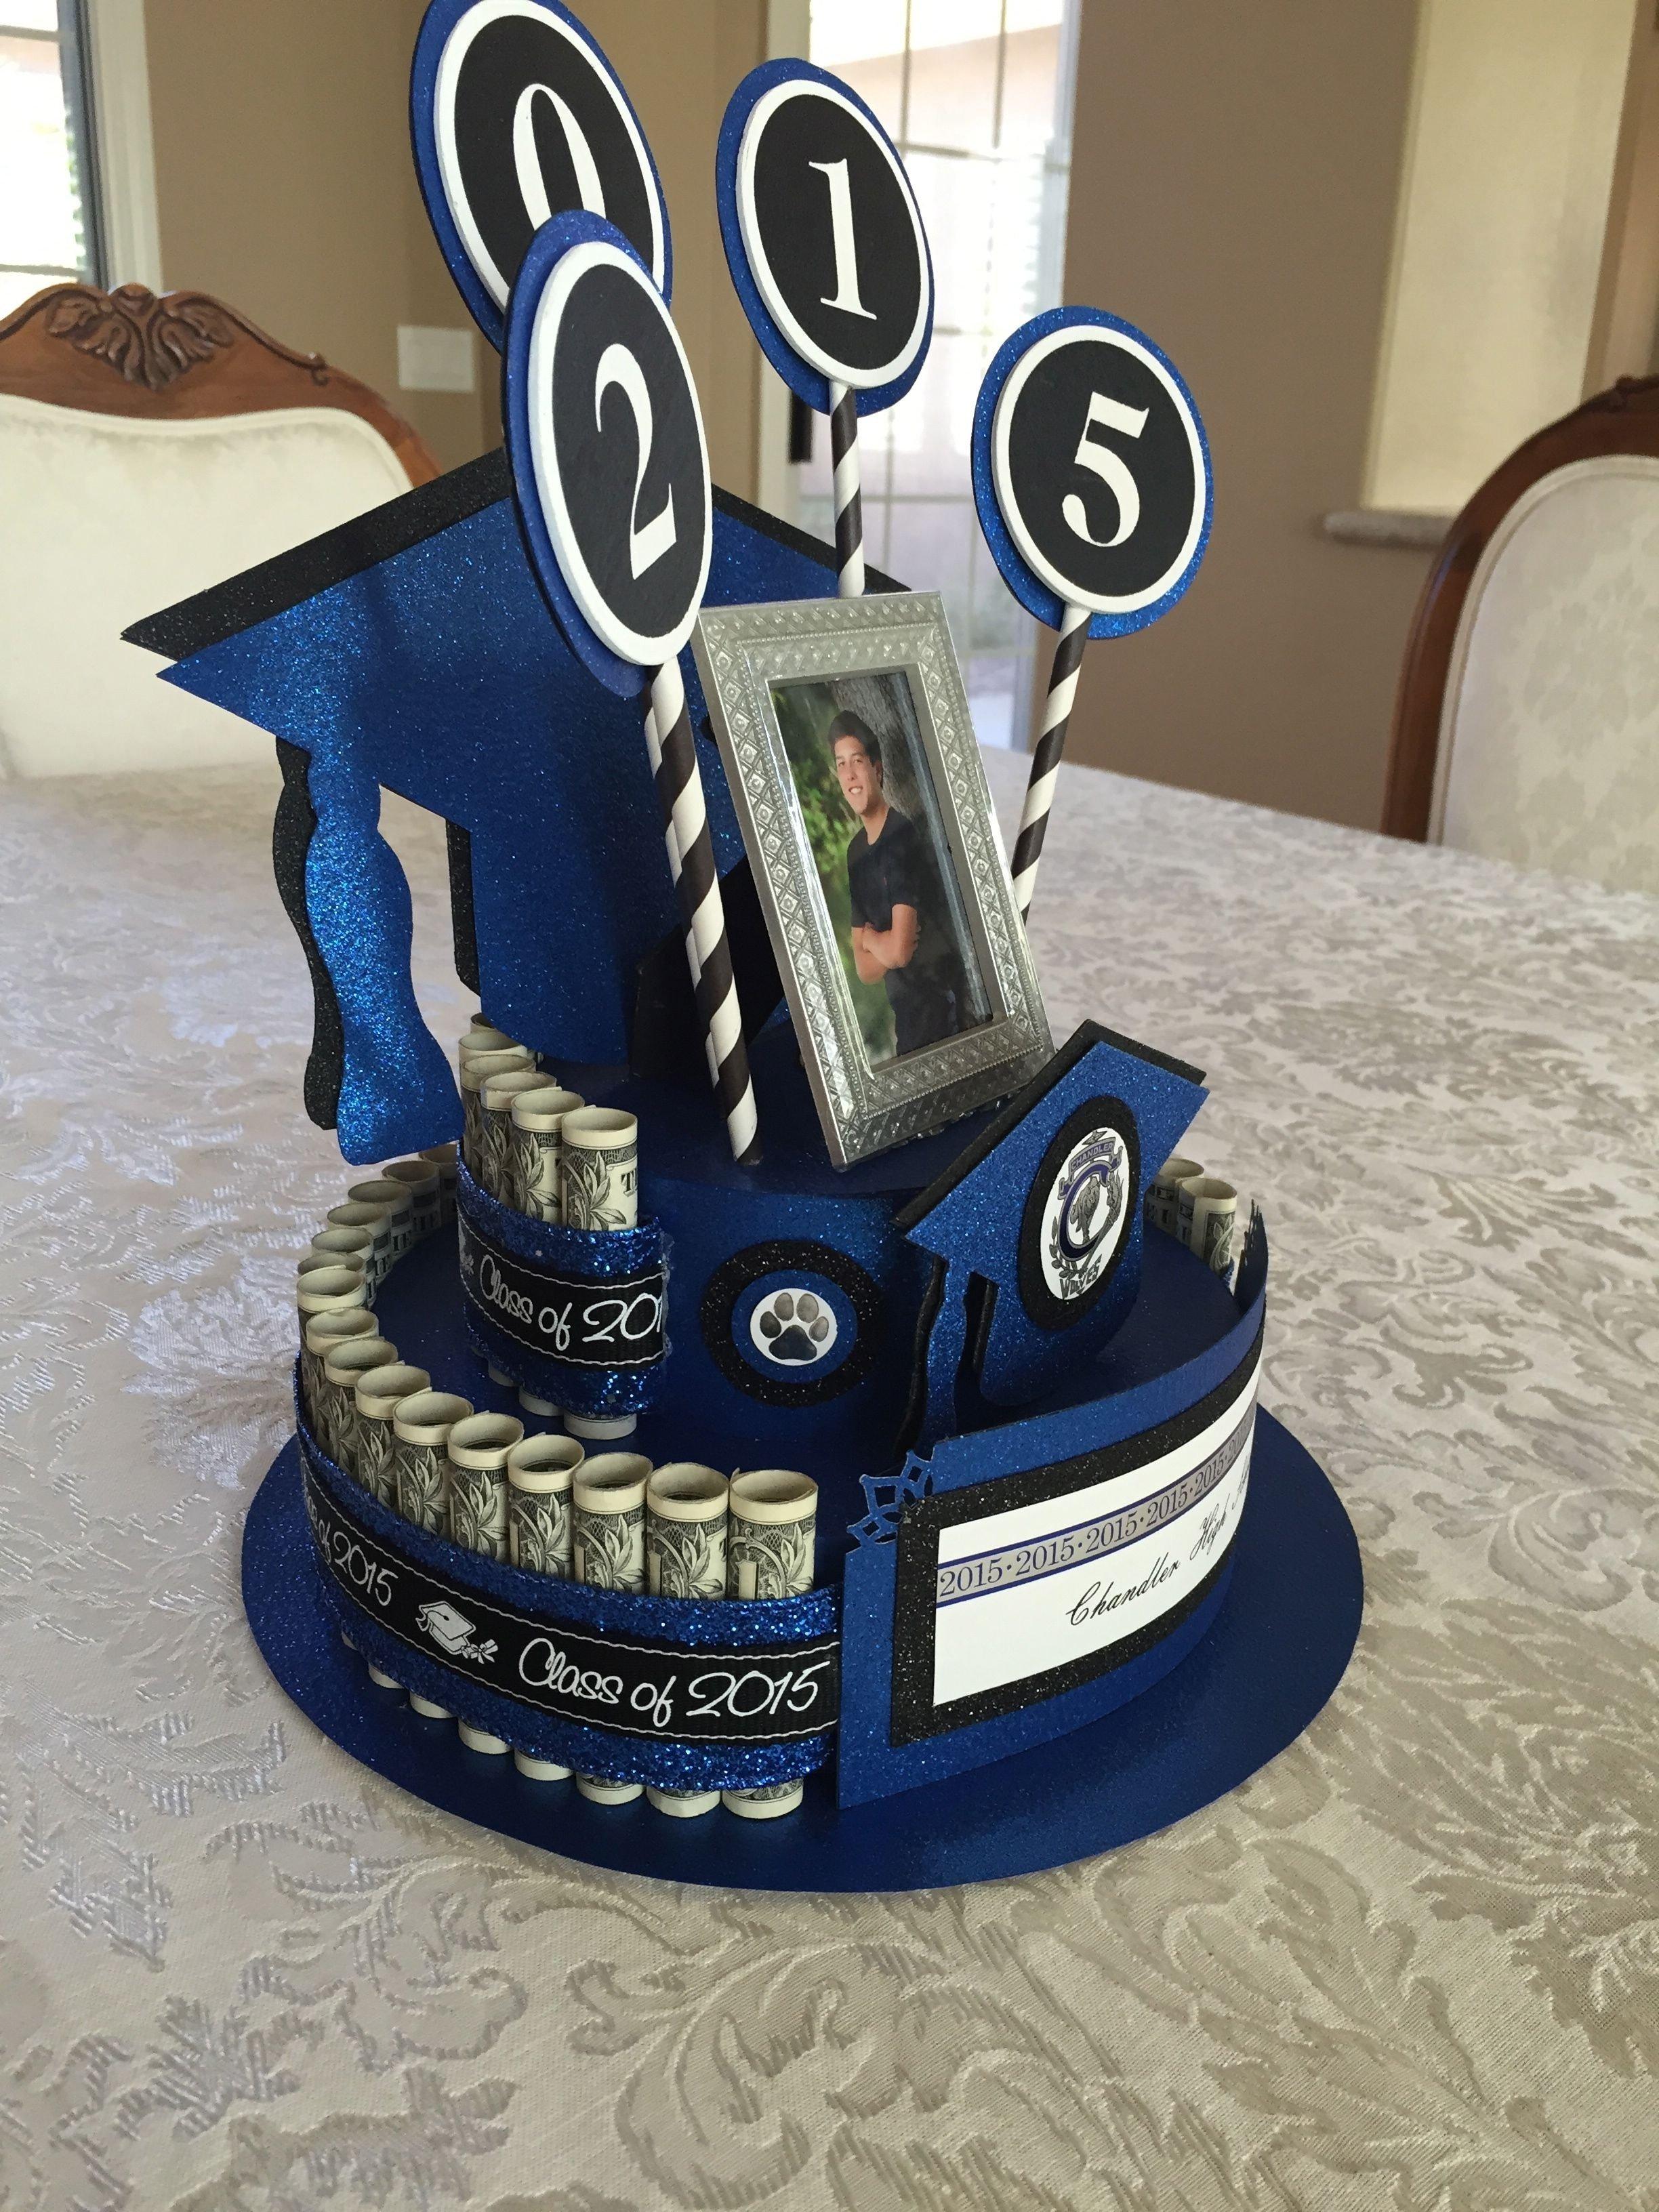 10 Wonderful Graduation Gift Ideas For Son graduation money cake beckys creations pinterest money cake 1 2021